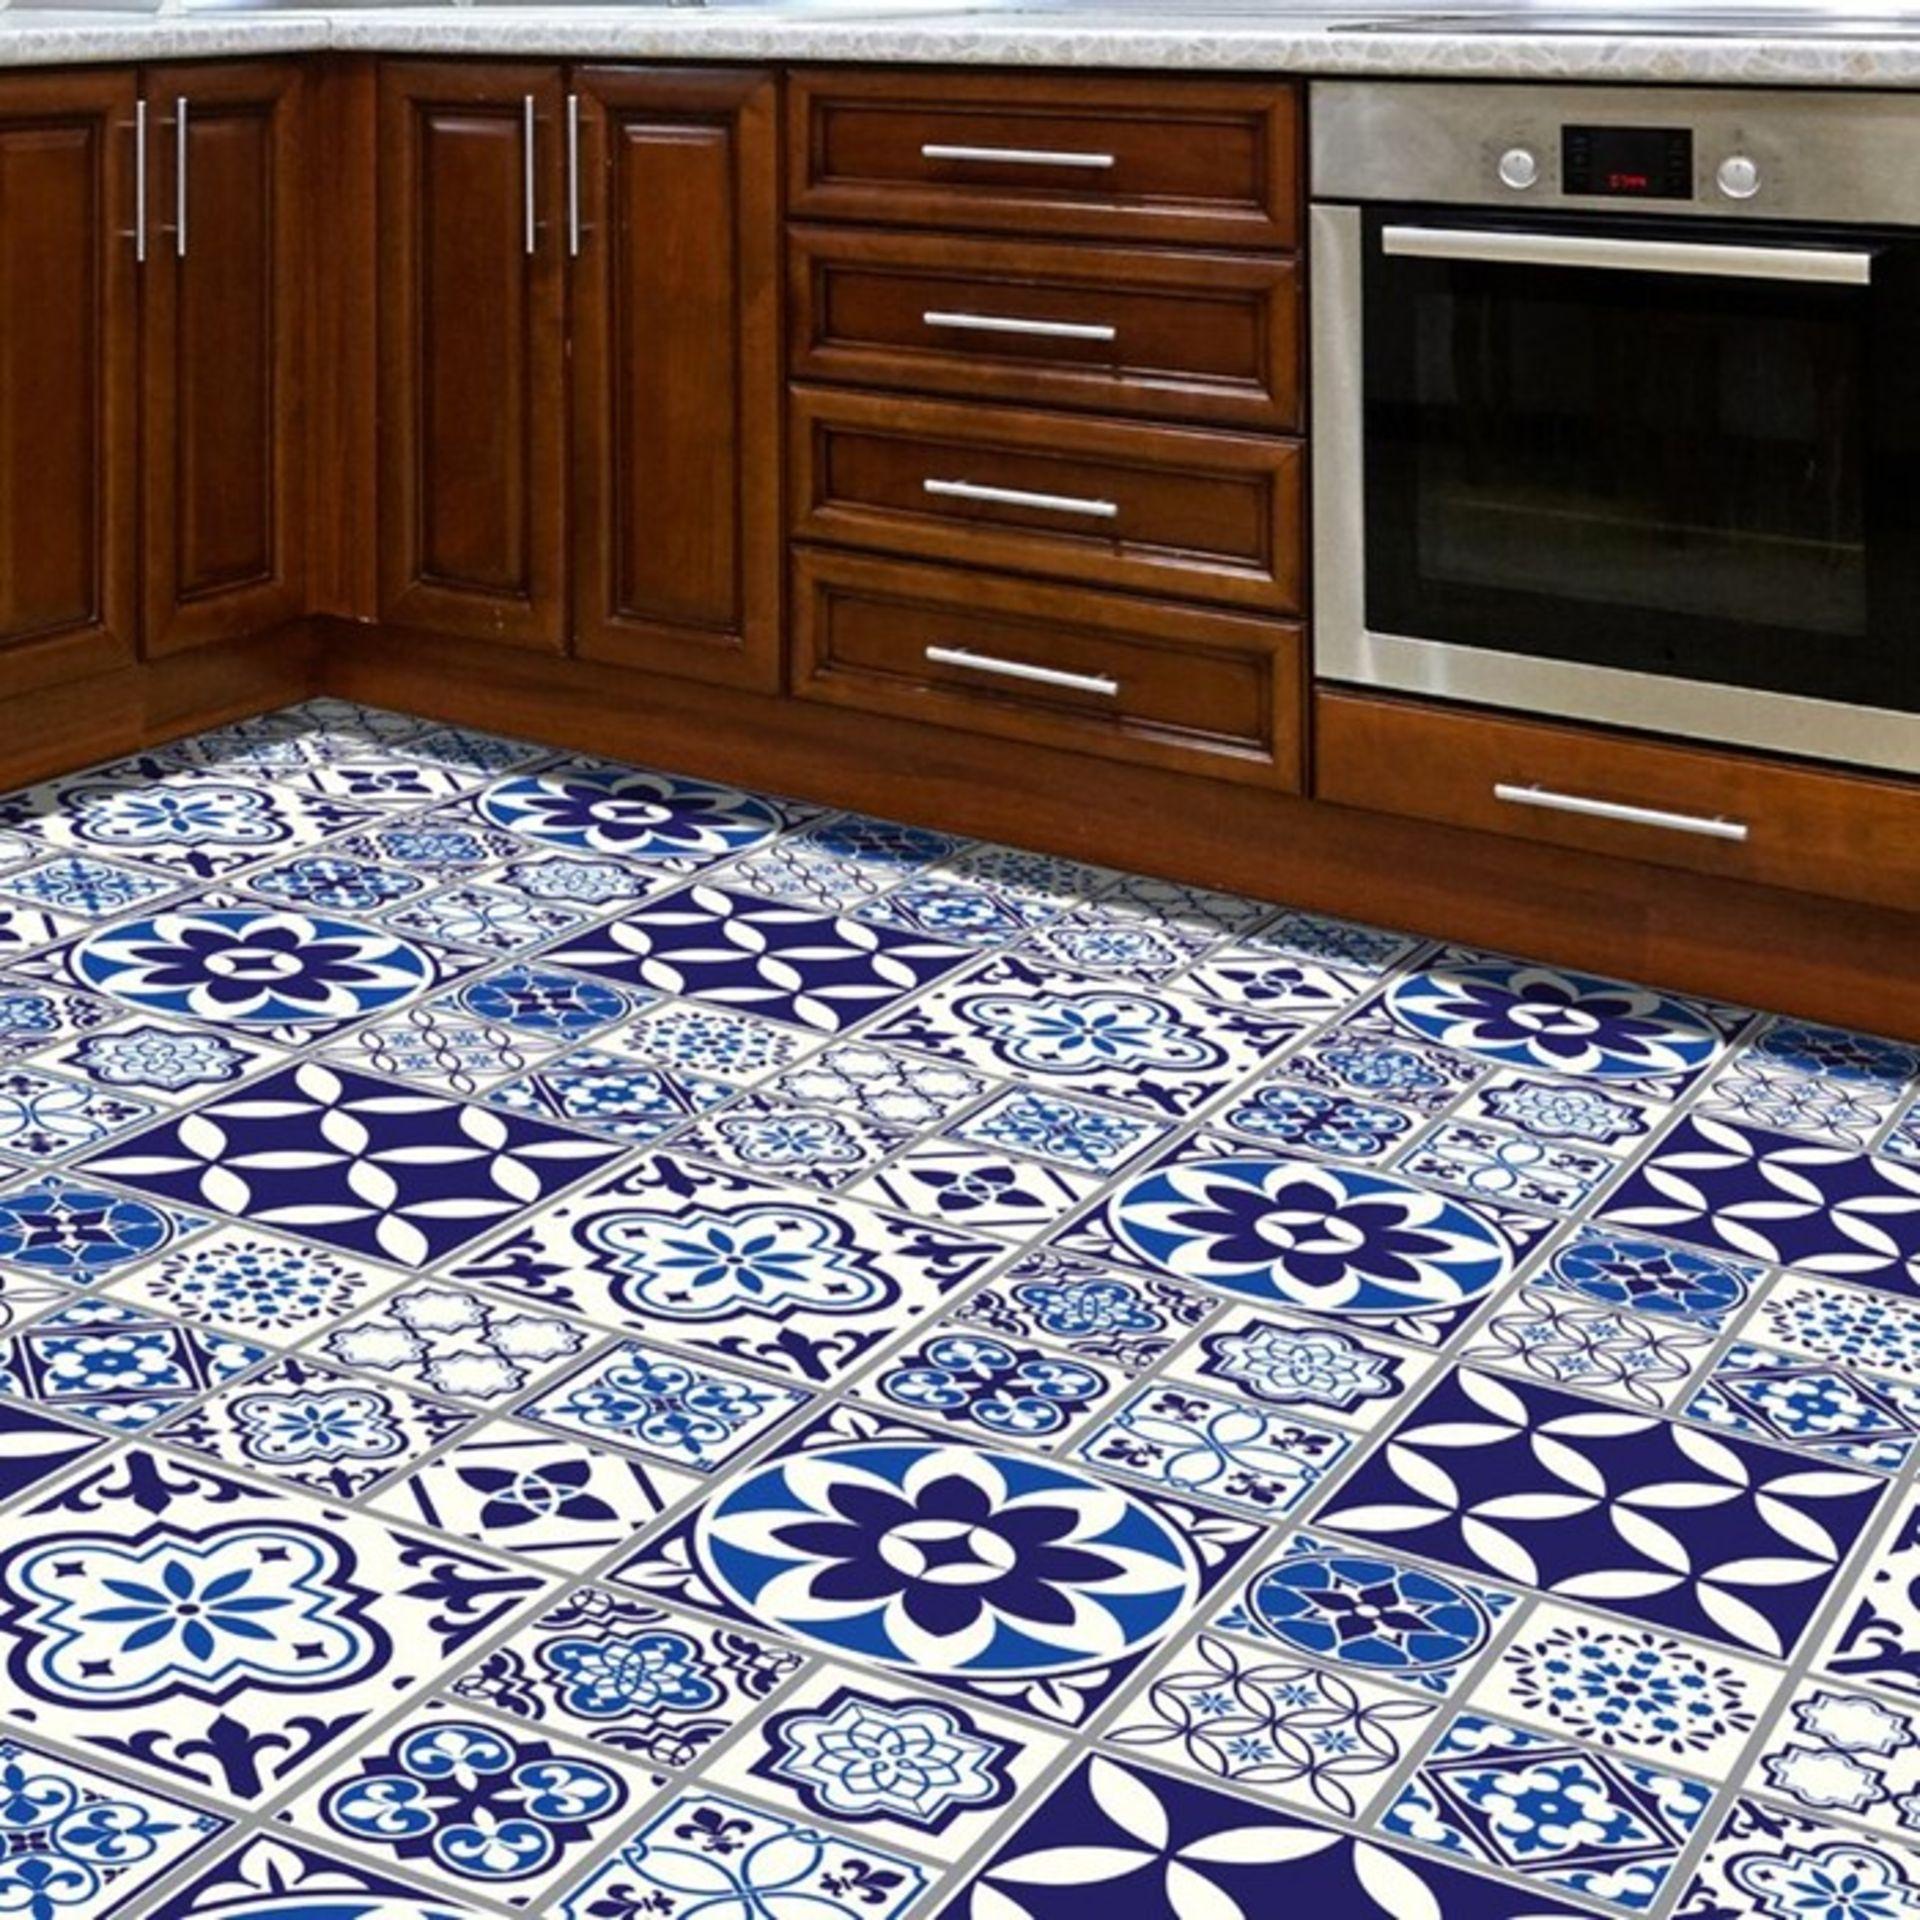 World Menagerie, Waller 120x60 cm Mosaic Tile in B